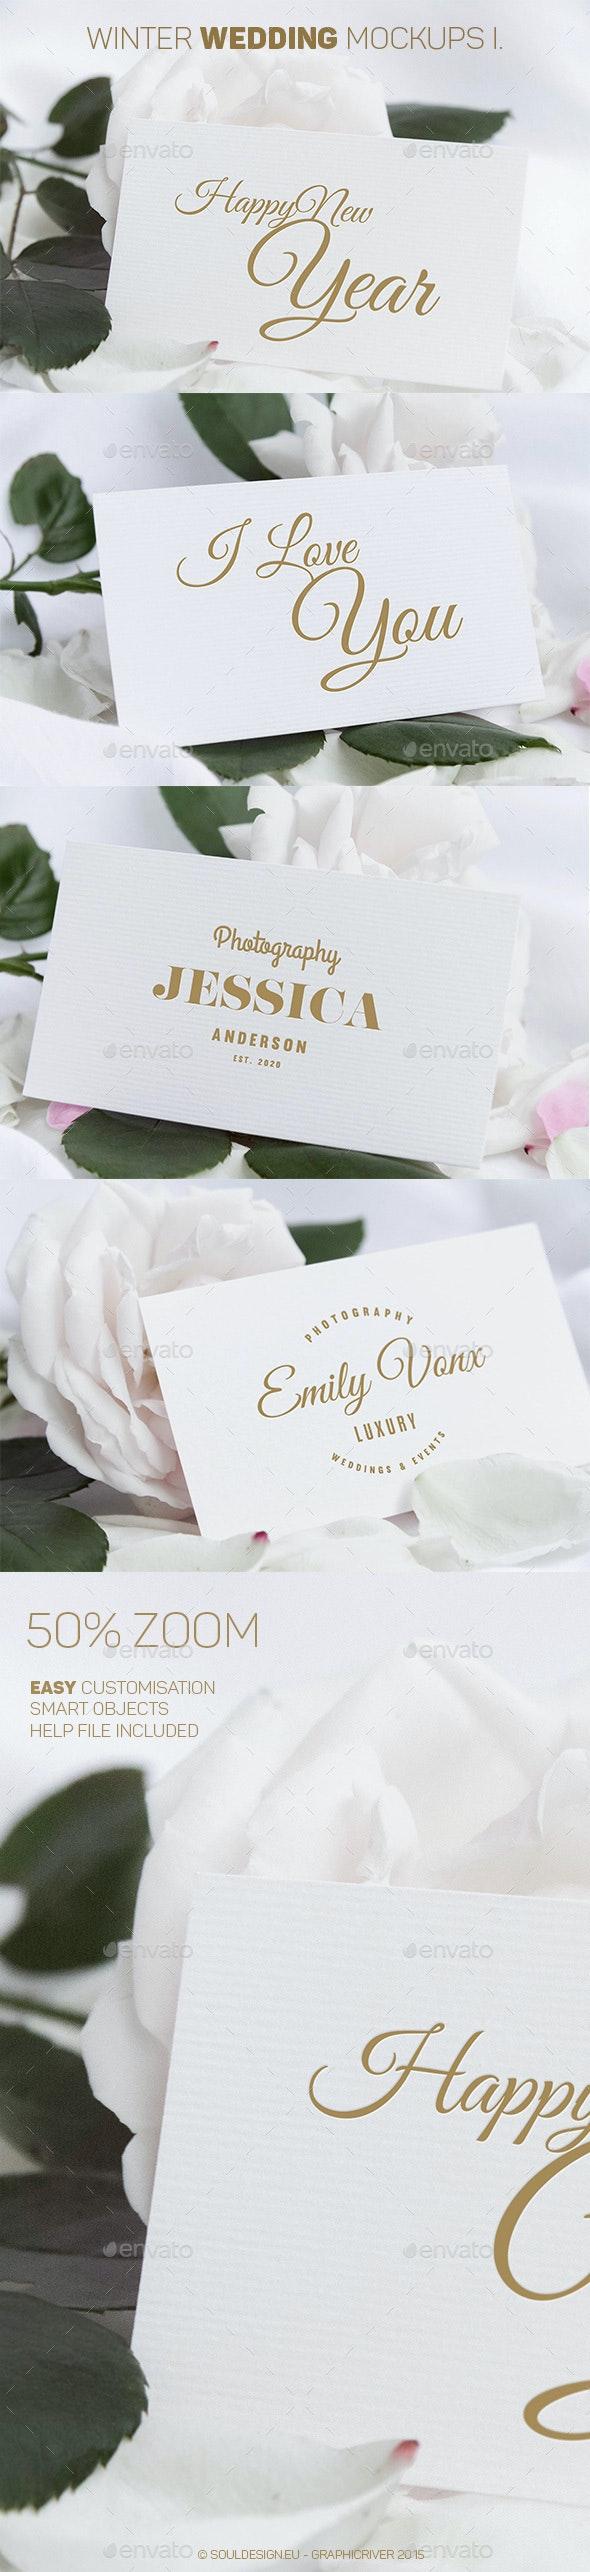 Winter Wedding Mockups I. - Miscellaneous Print